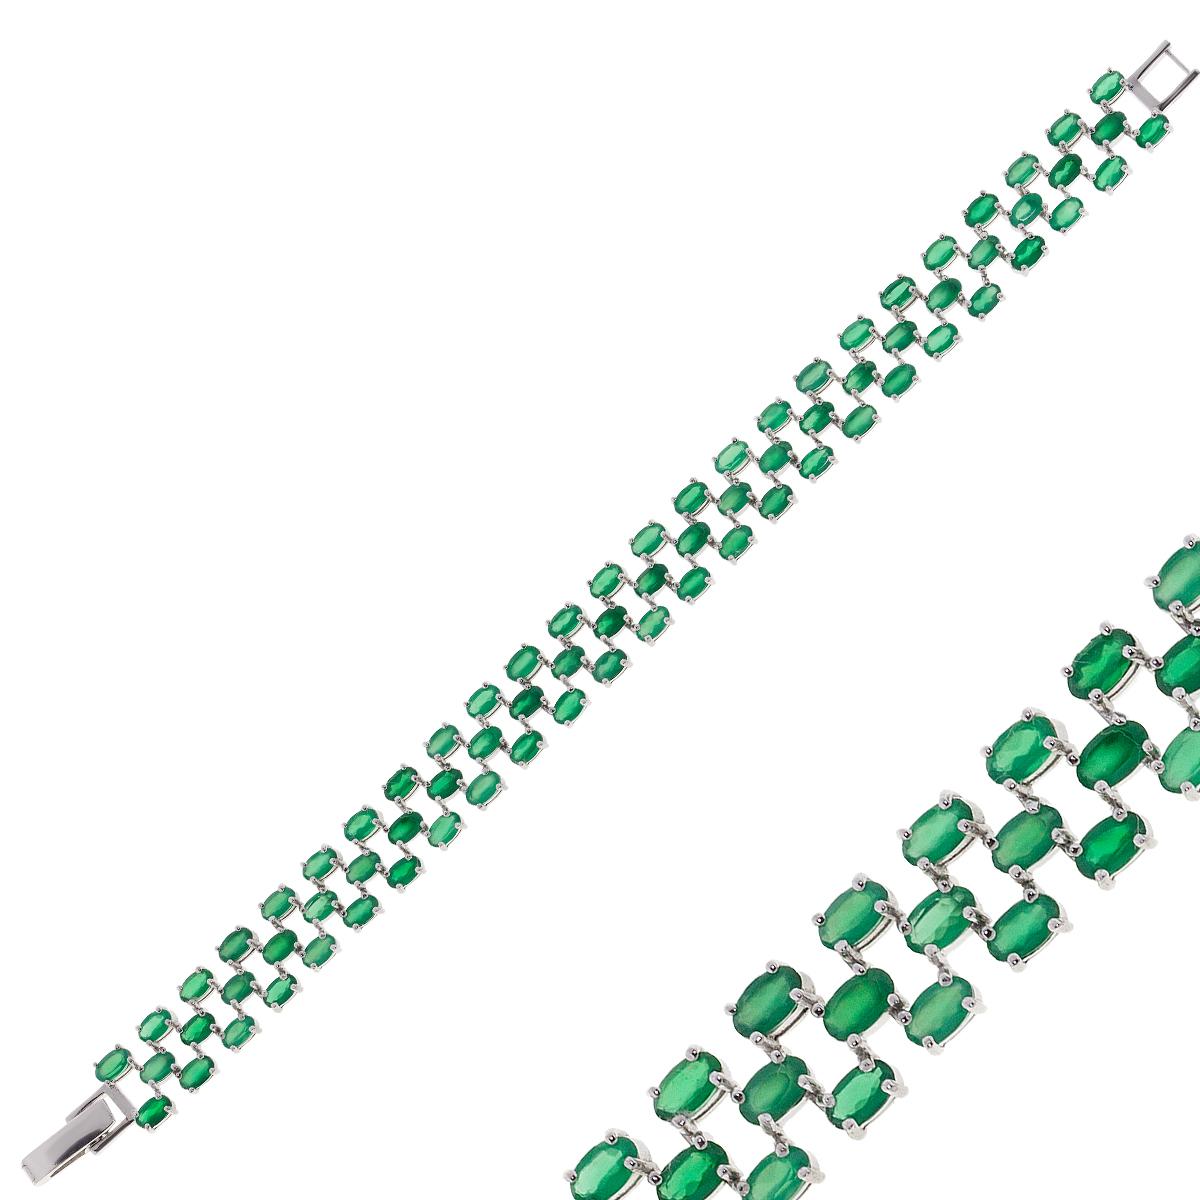 Браслет женский Balex Jewellery 7405937690 из серебра, хризопраз, р. 18